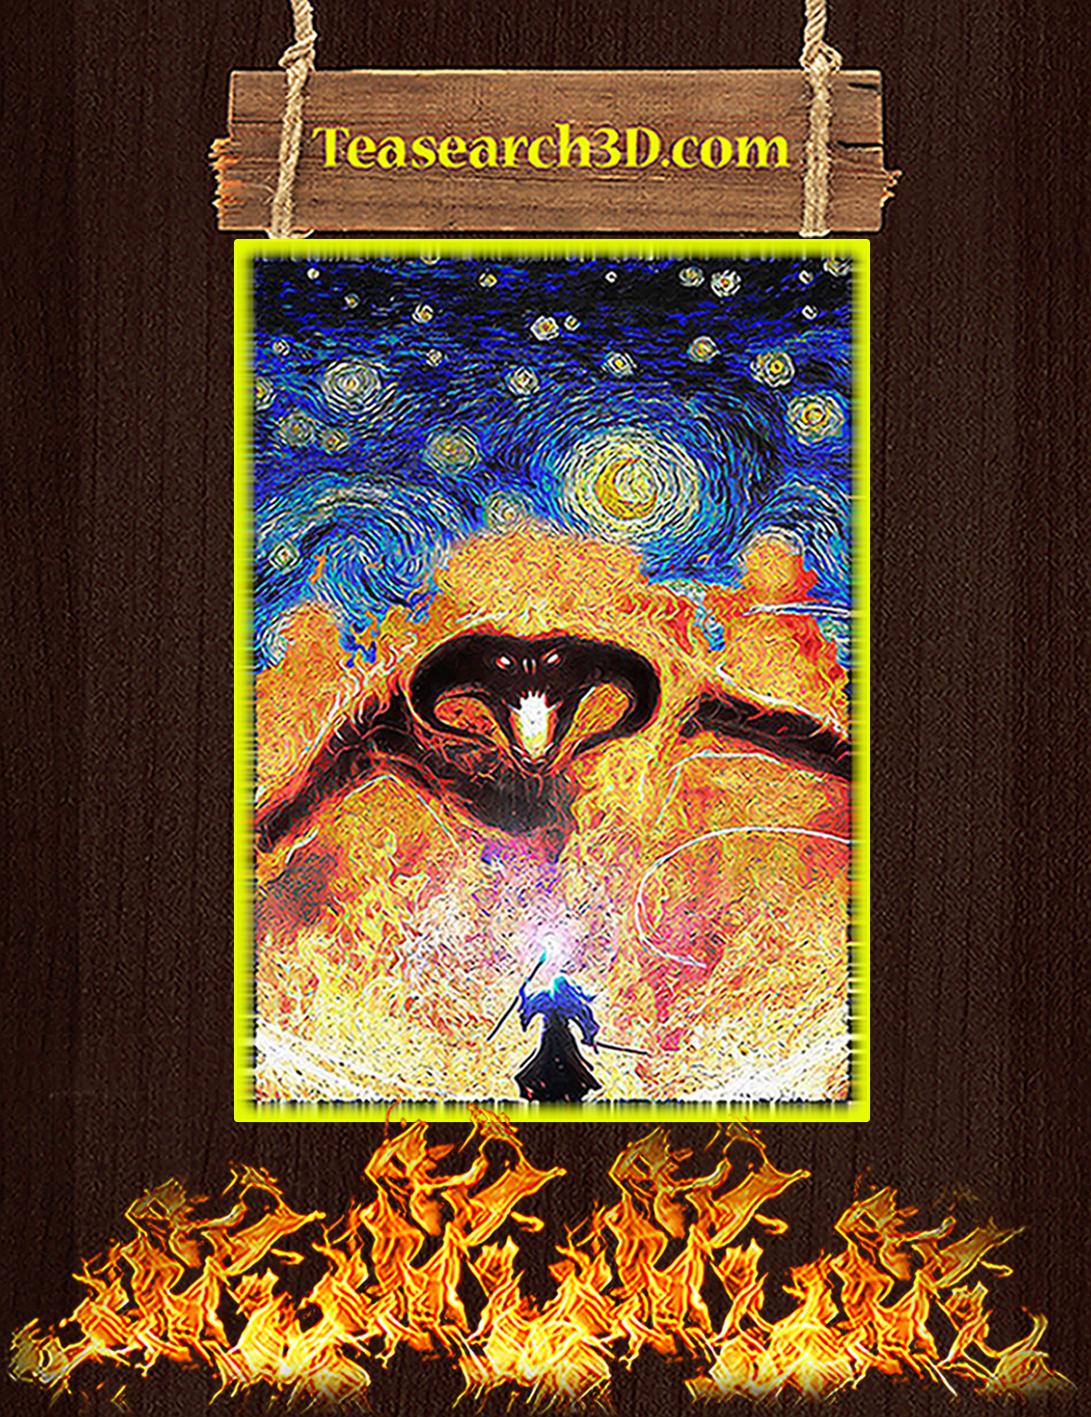 Balrog LOTR fire demon starry night poster A2